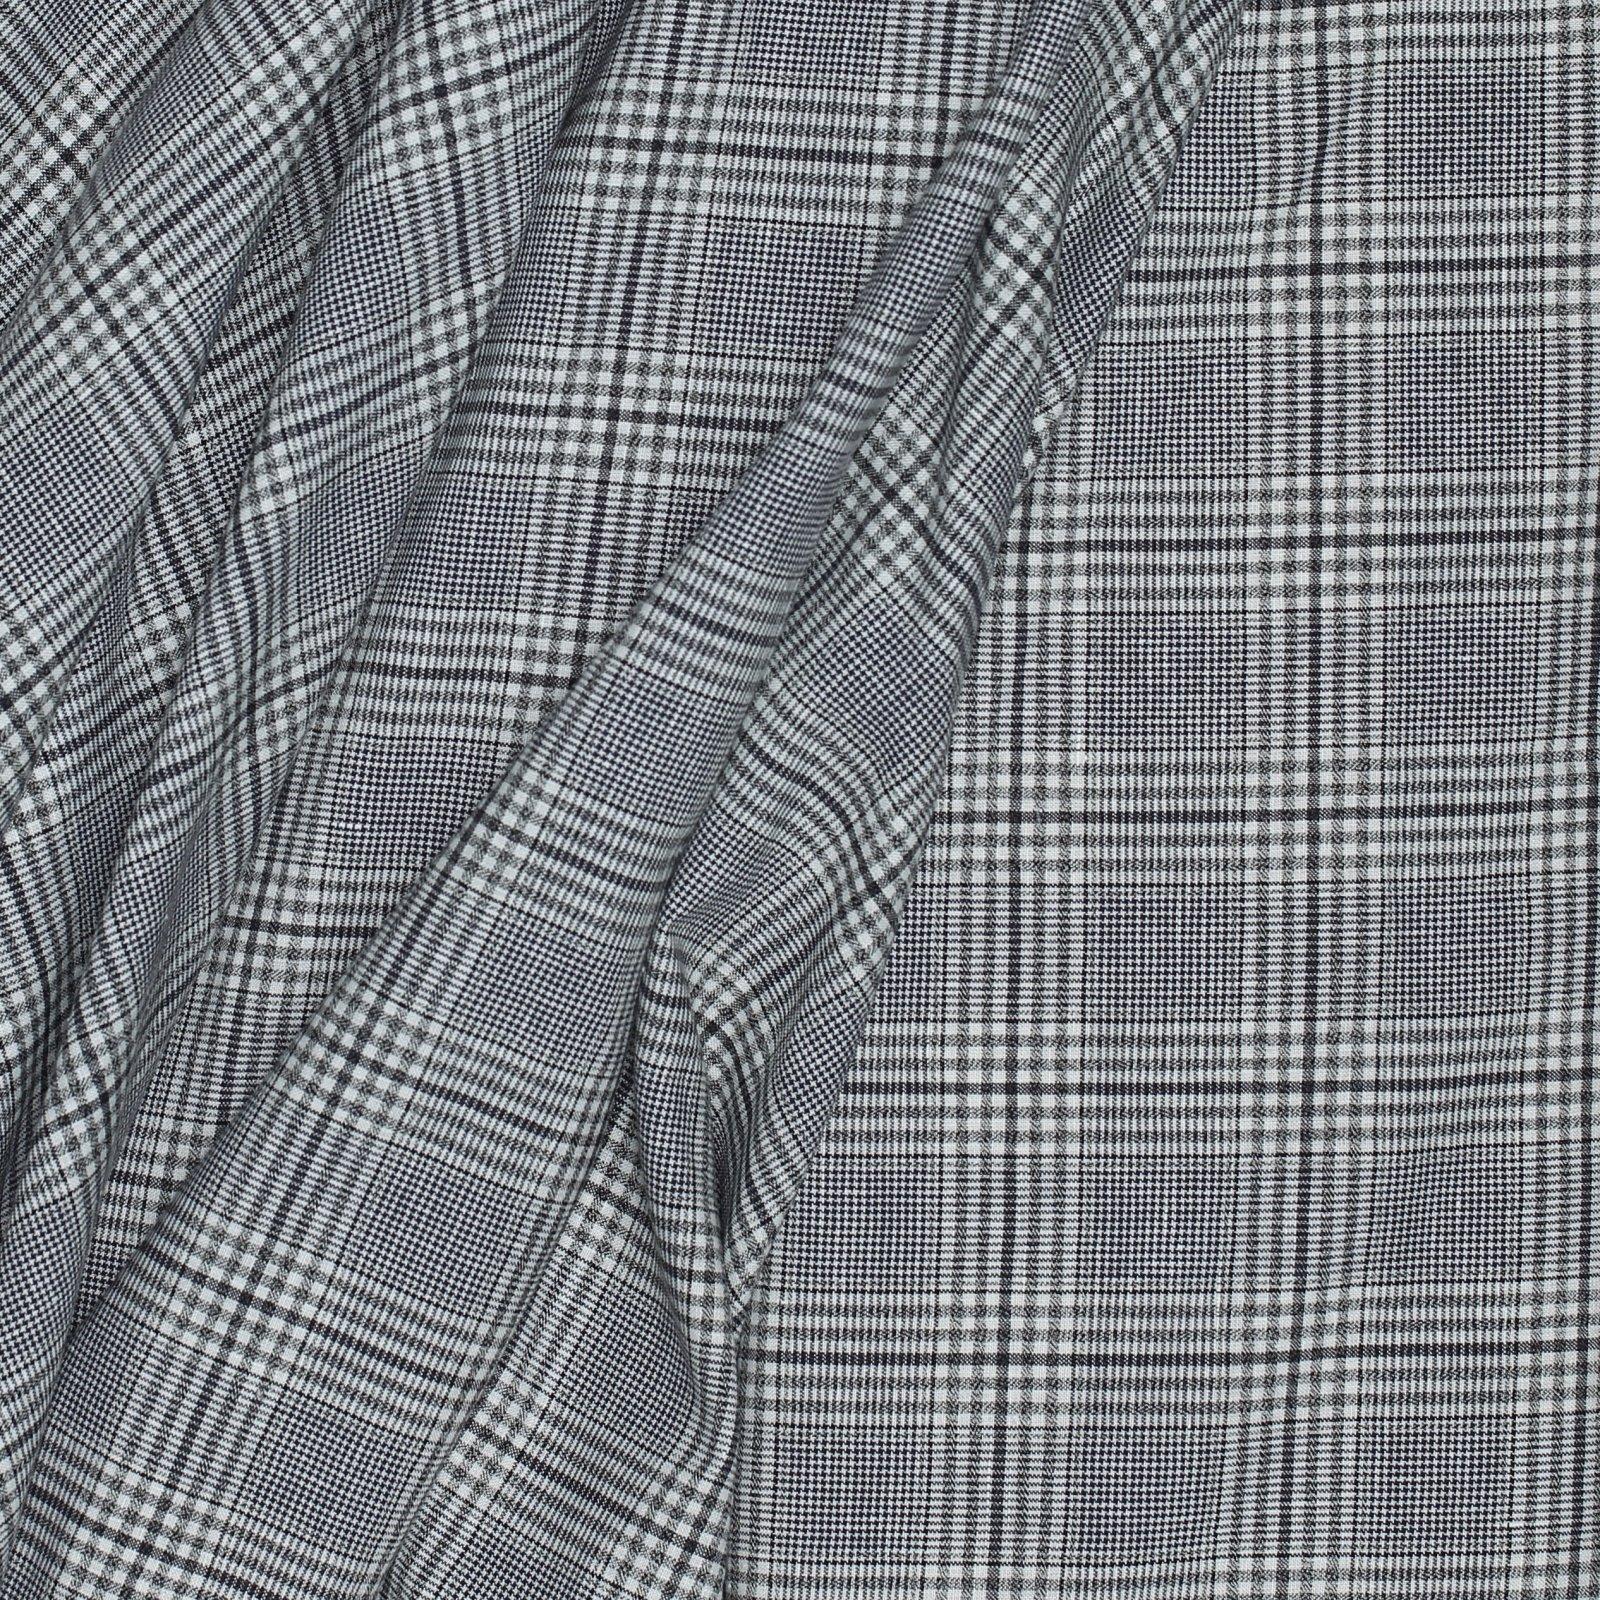 Black on White Woven Plaid Italian Wool/Cotton